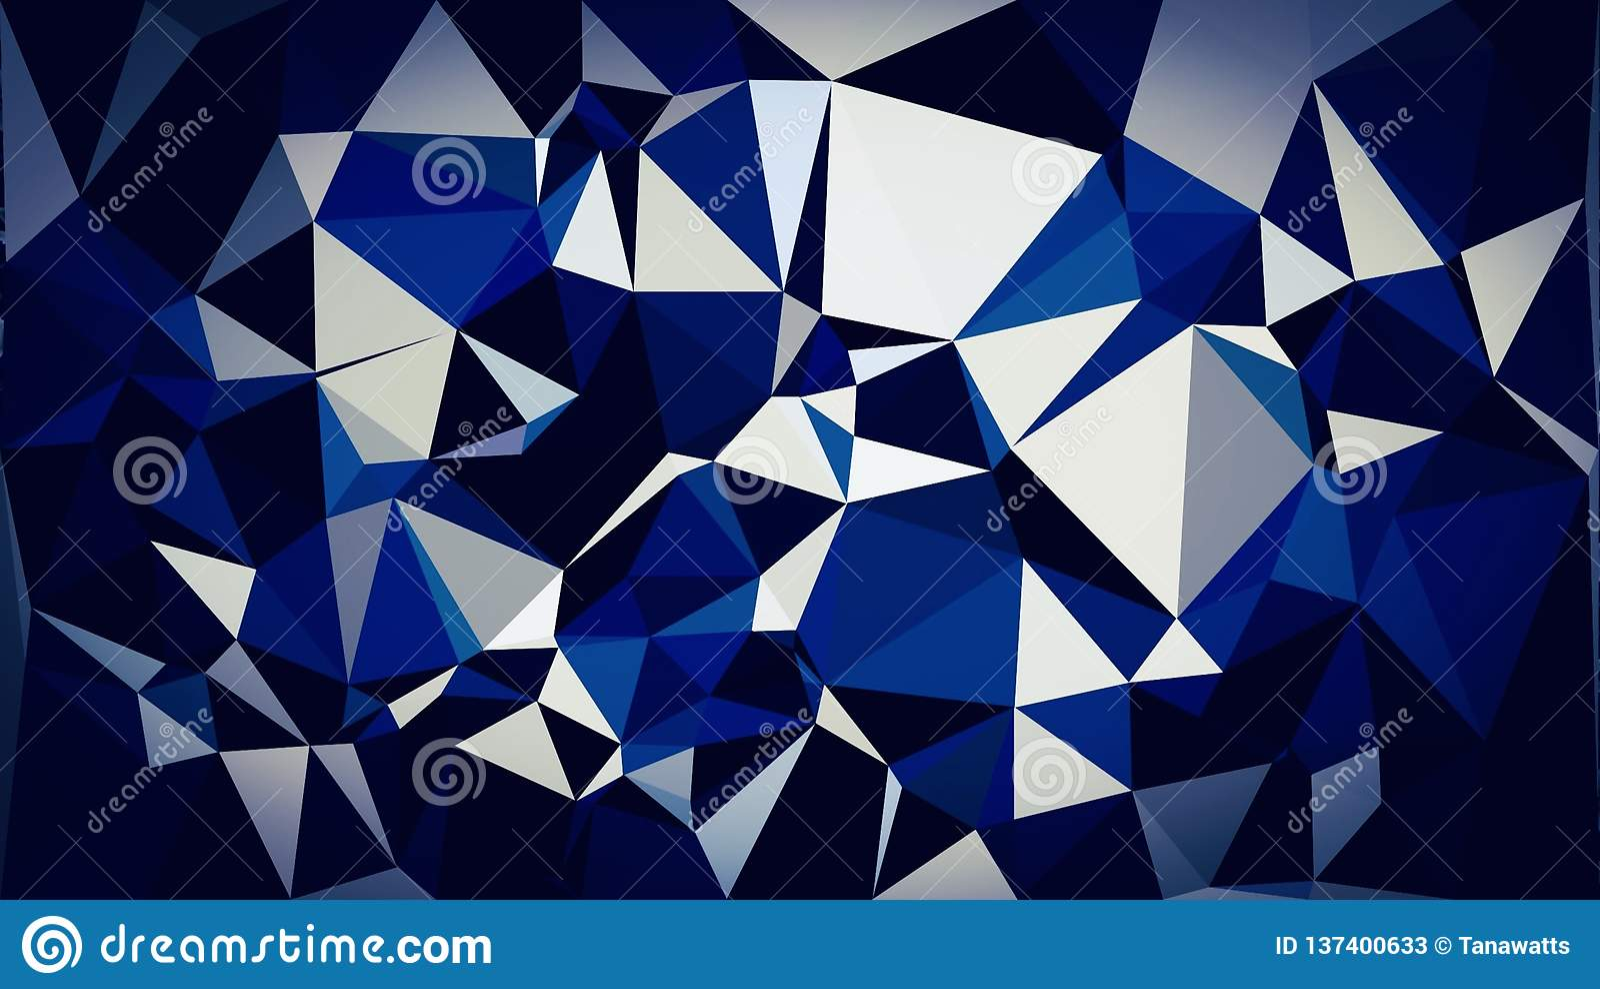 Abstract Bright Blue White Dark Black White Color Wallpaper